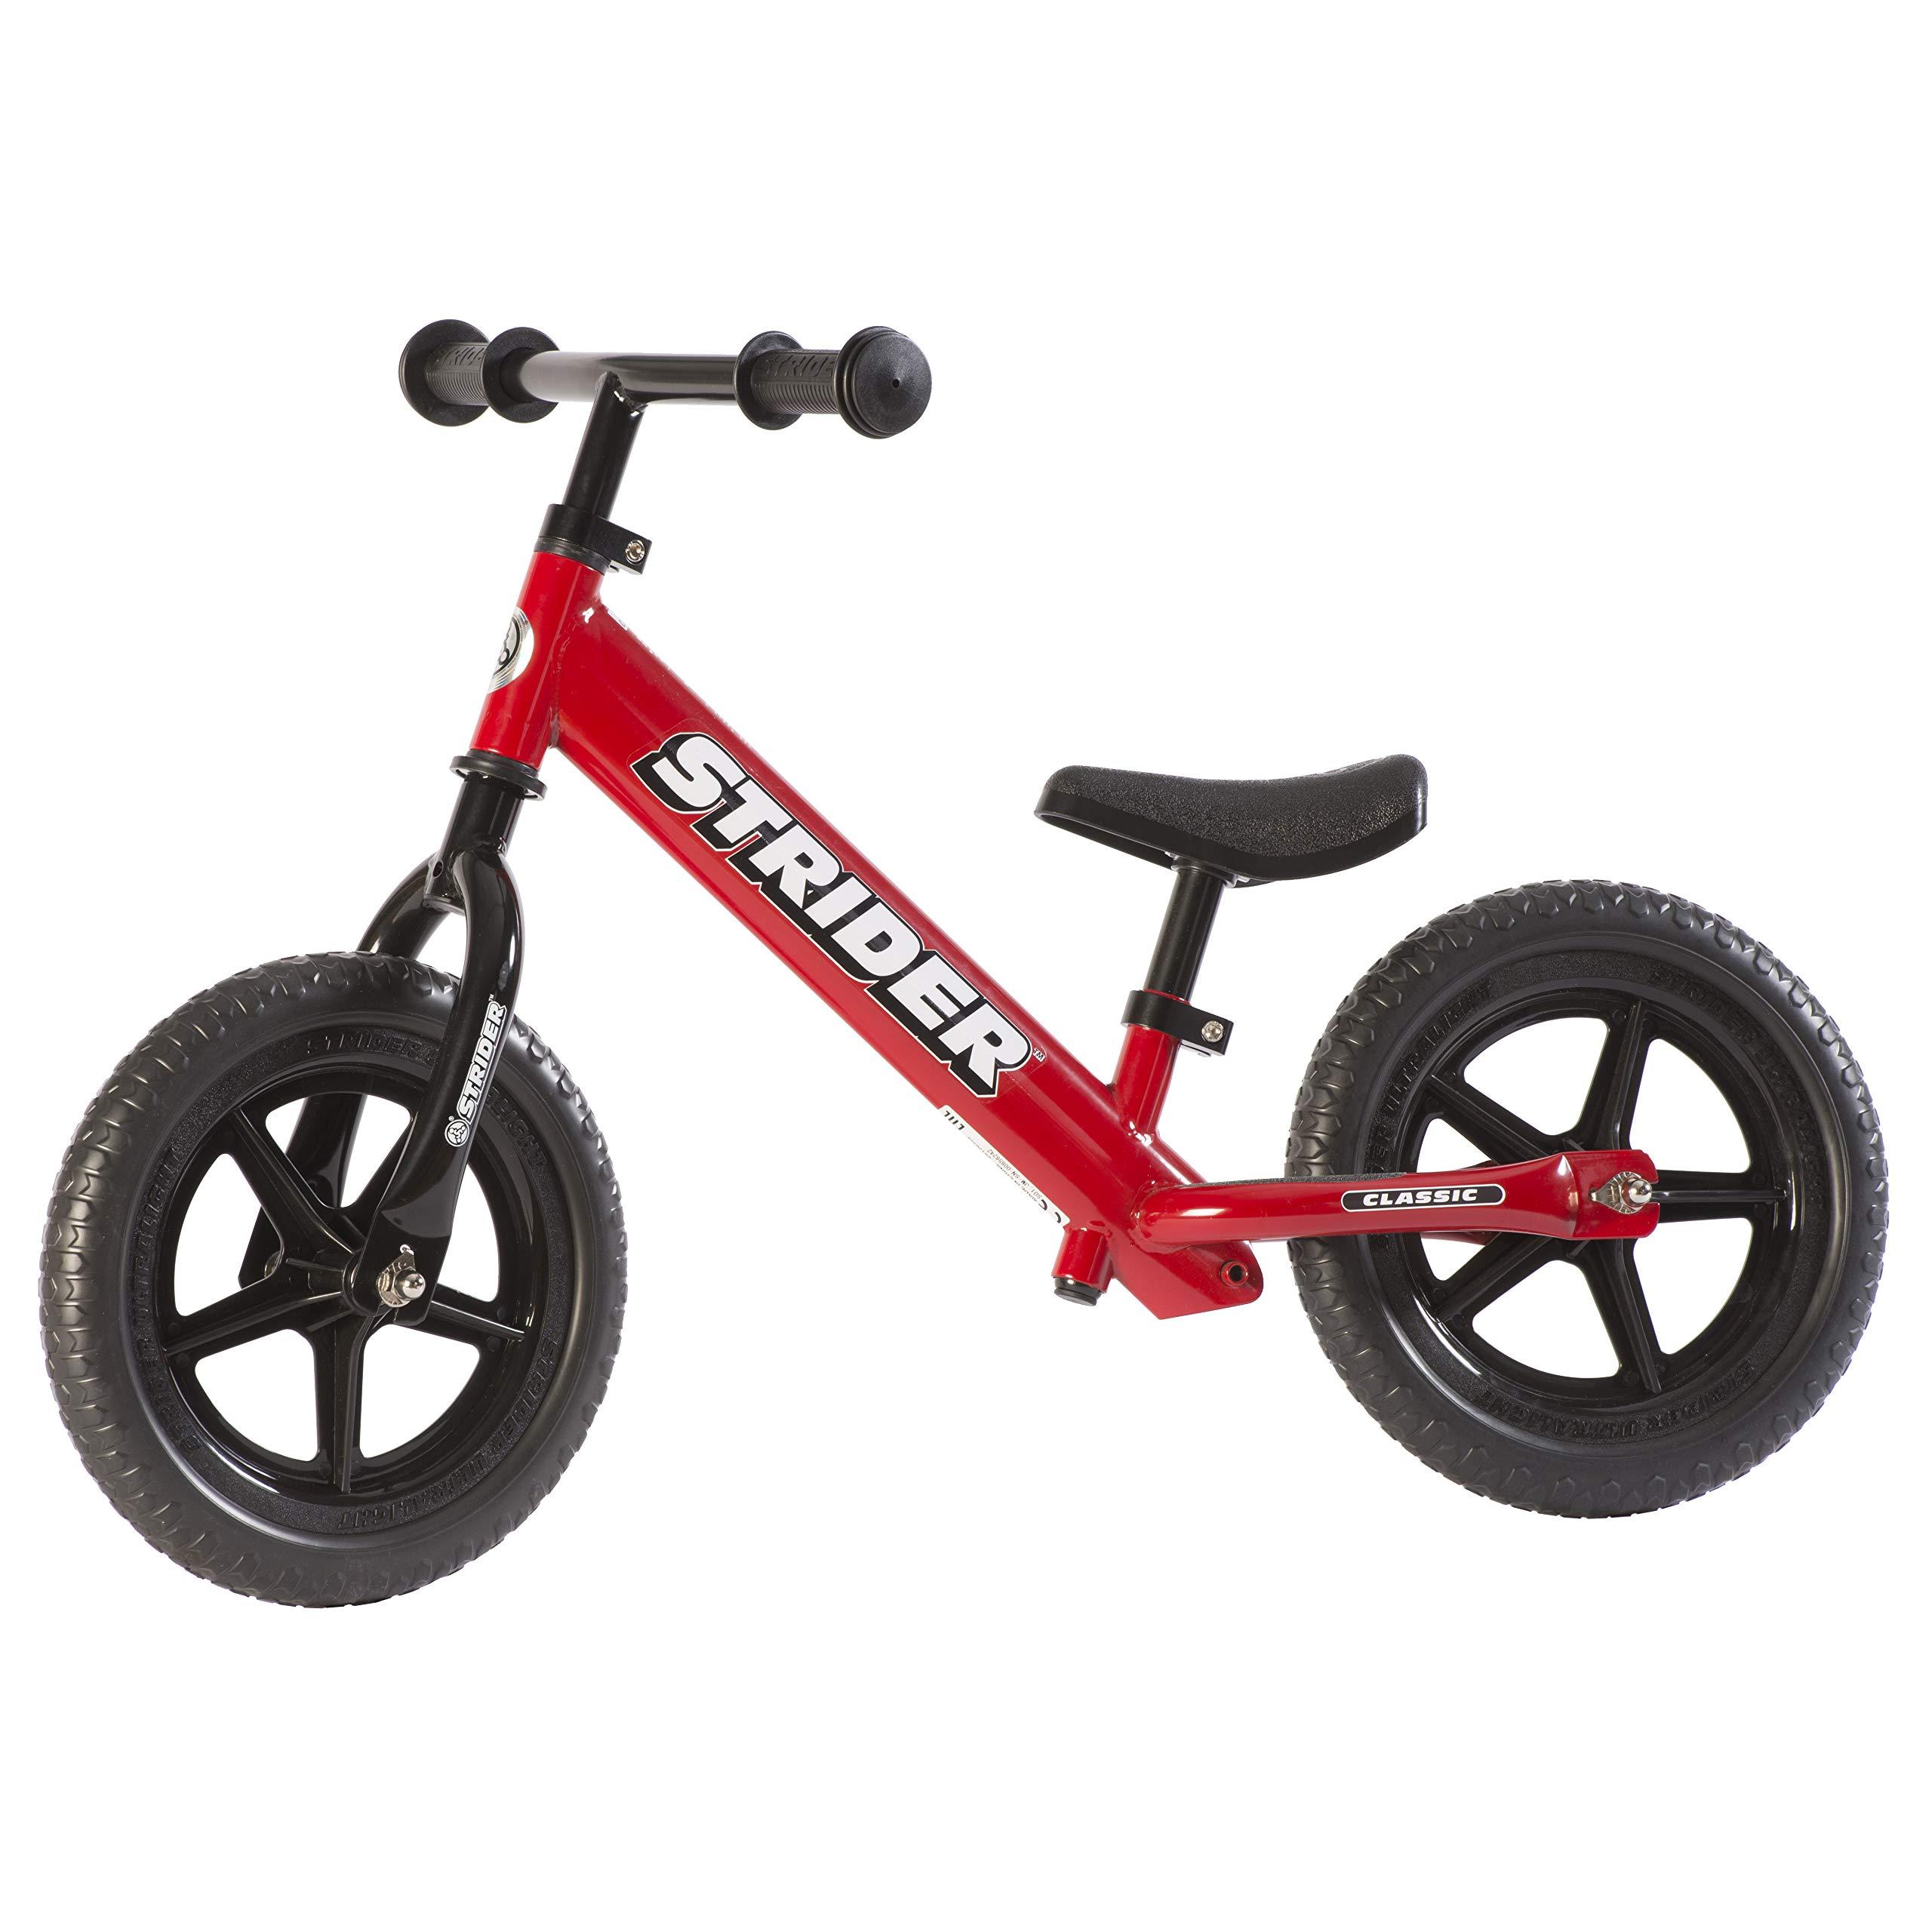 Strider 12 Classic No-Pedal Balance Bike - Red